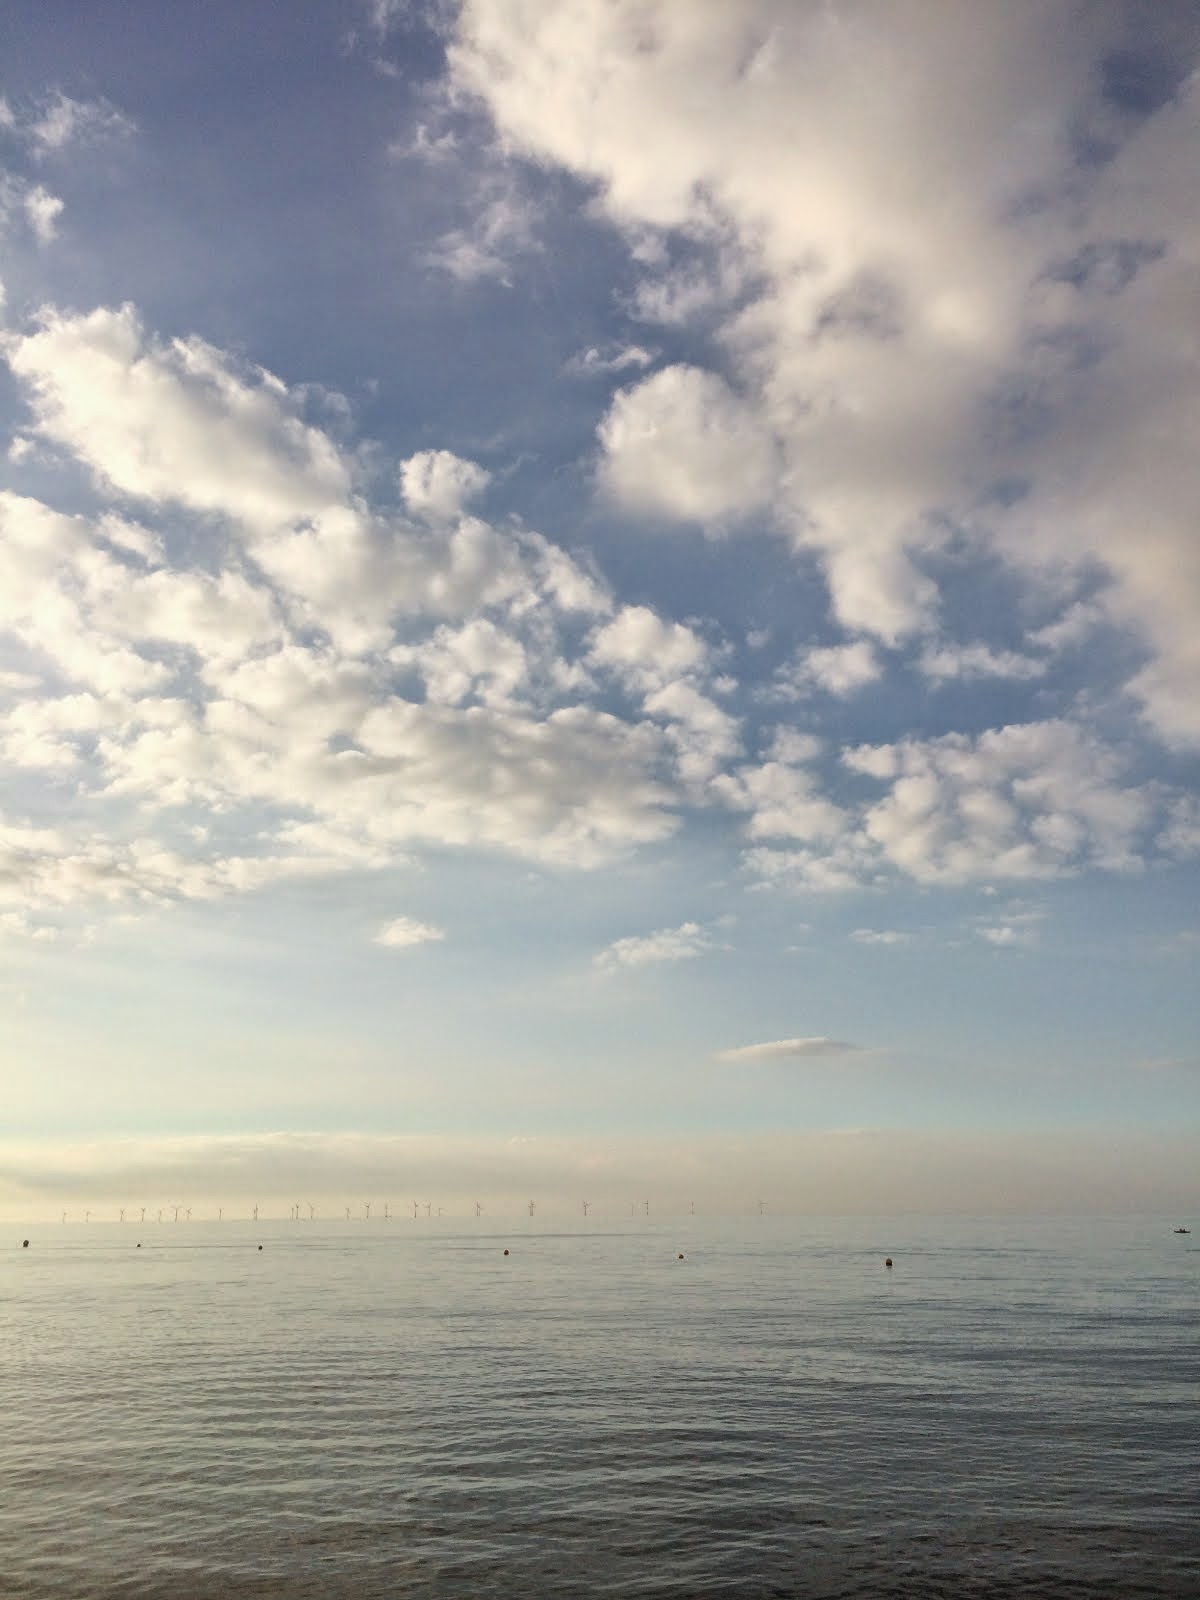 Evening in Herne Bay